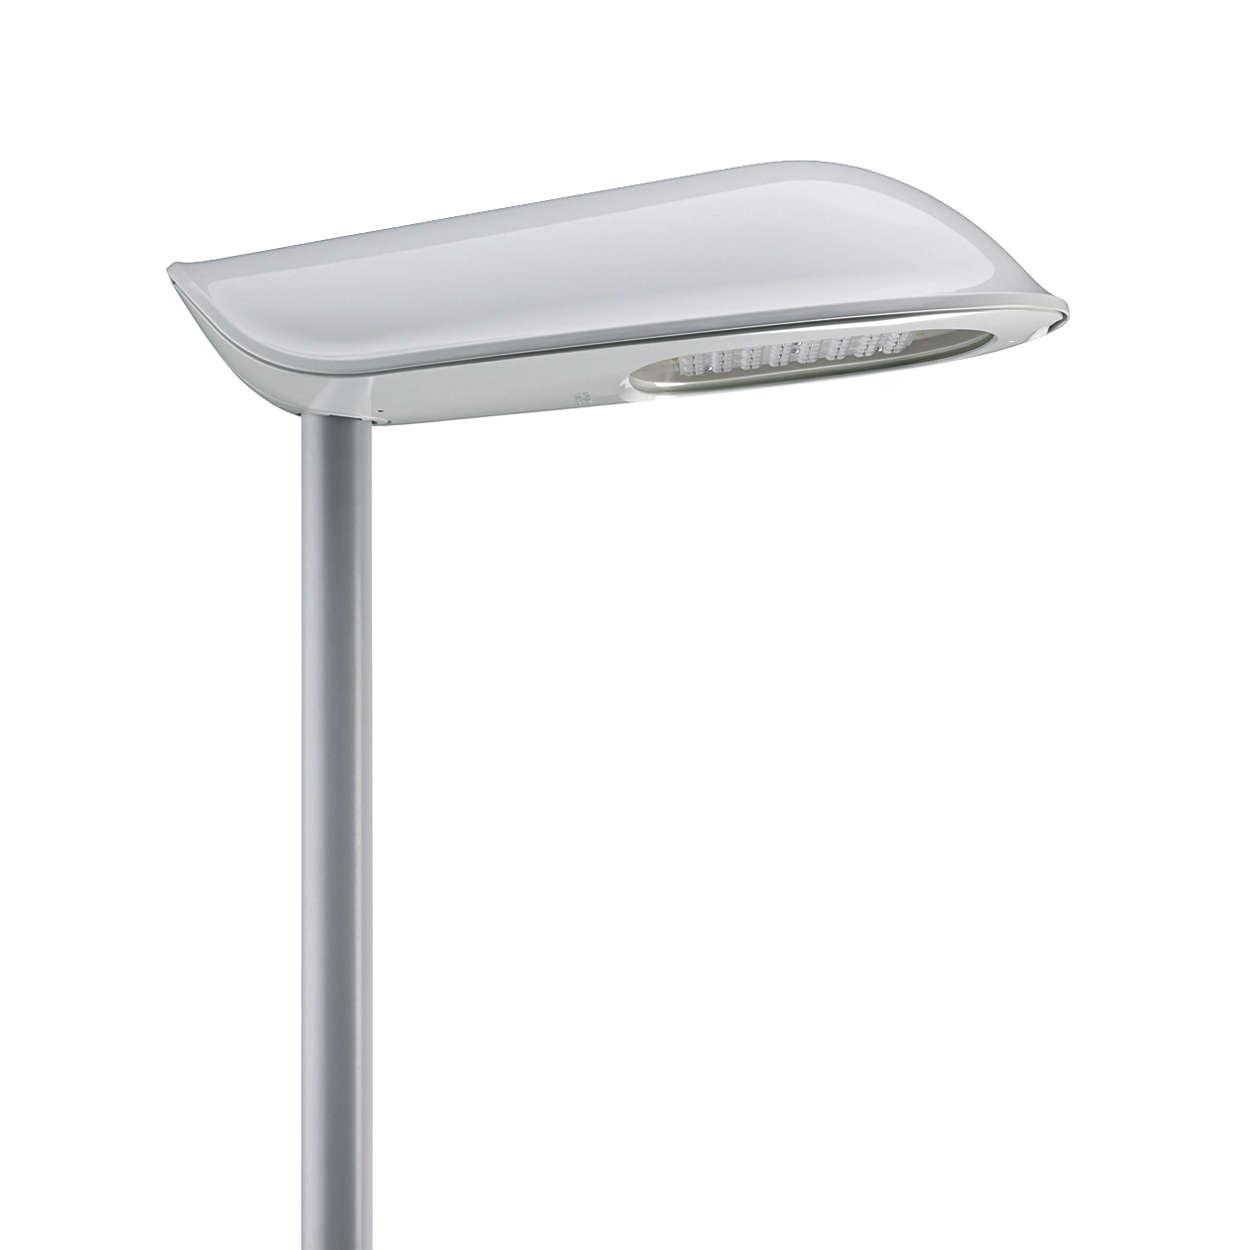 Iridium² LEDGINE – gör resan ljusare